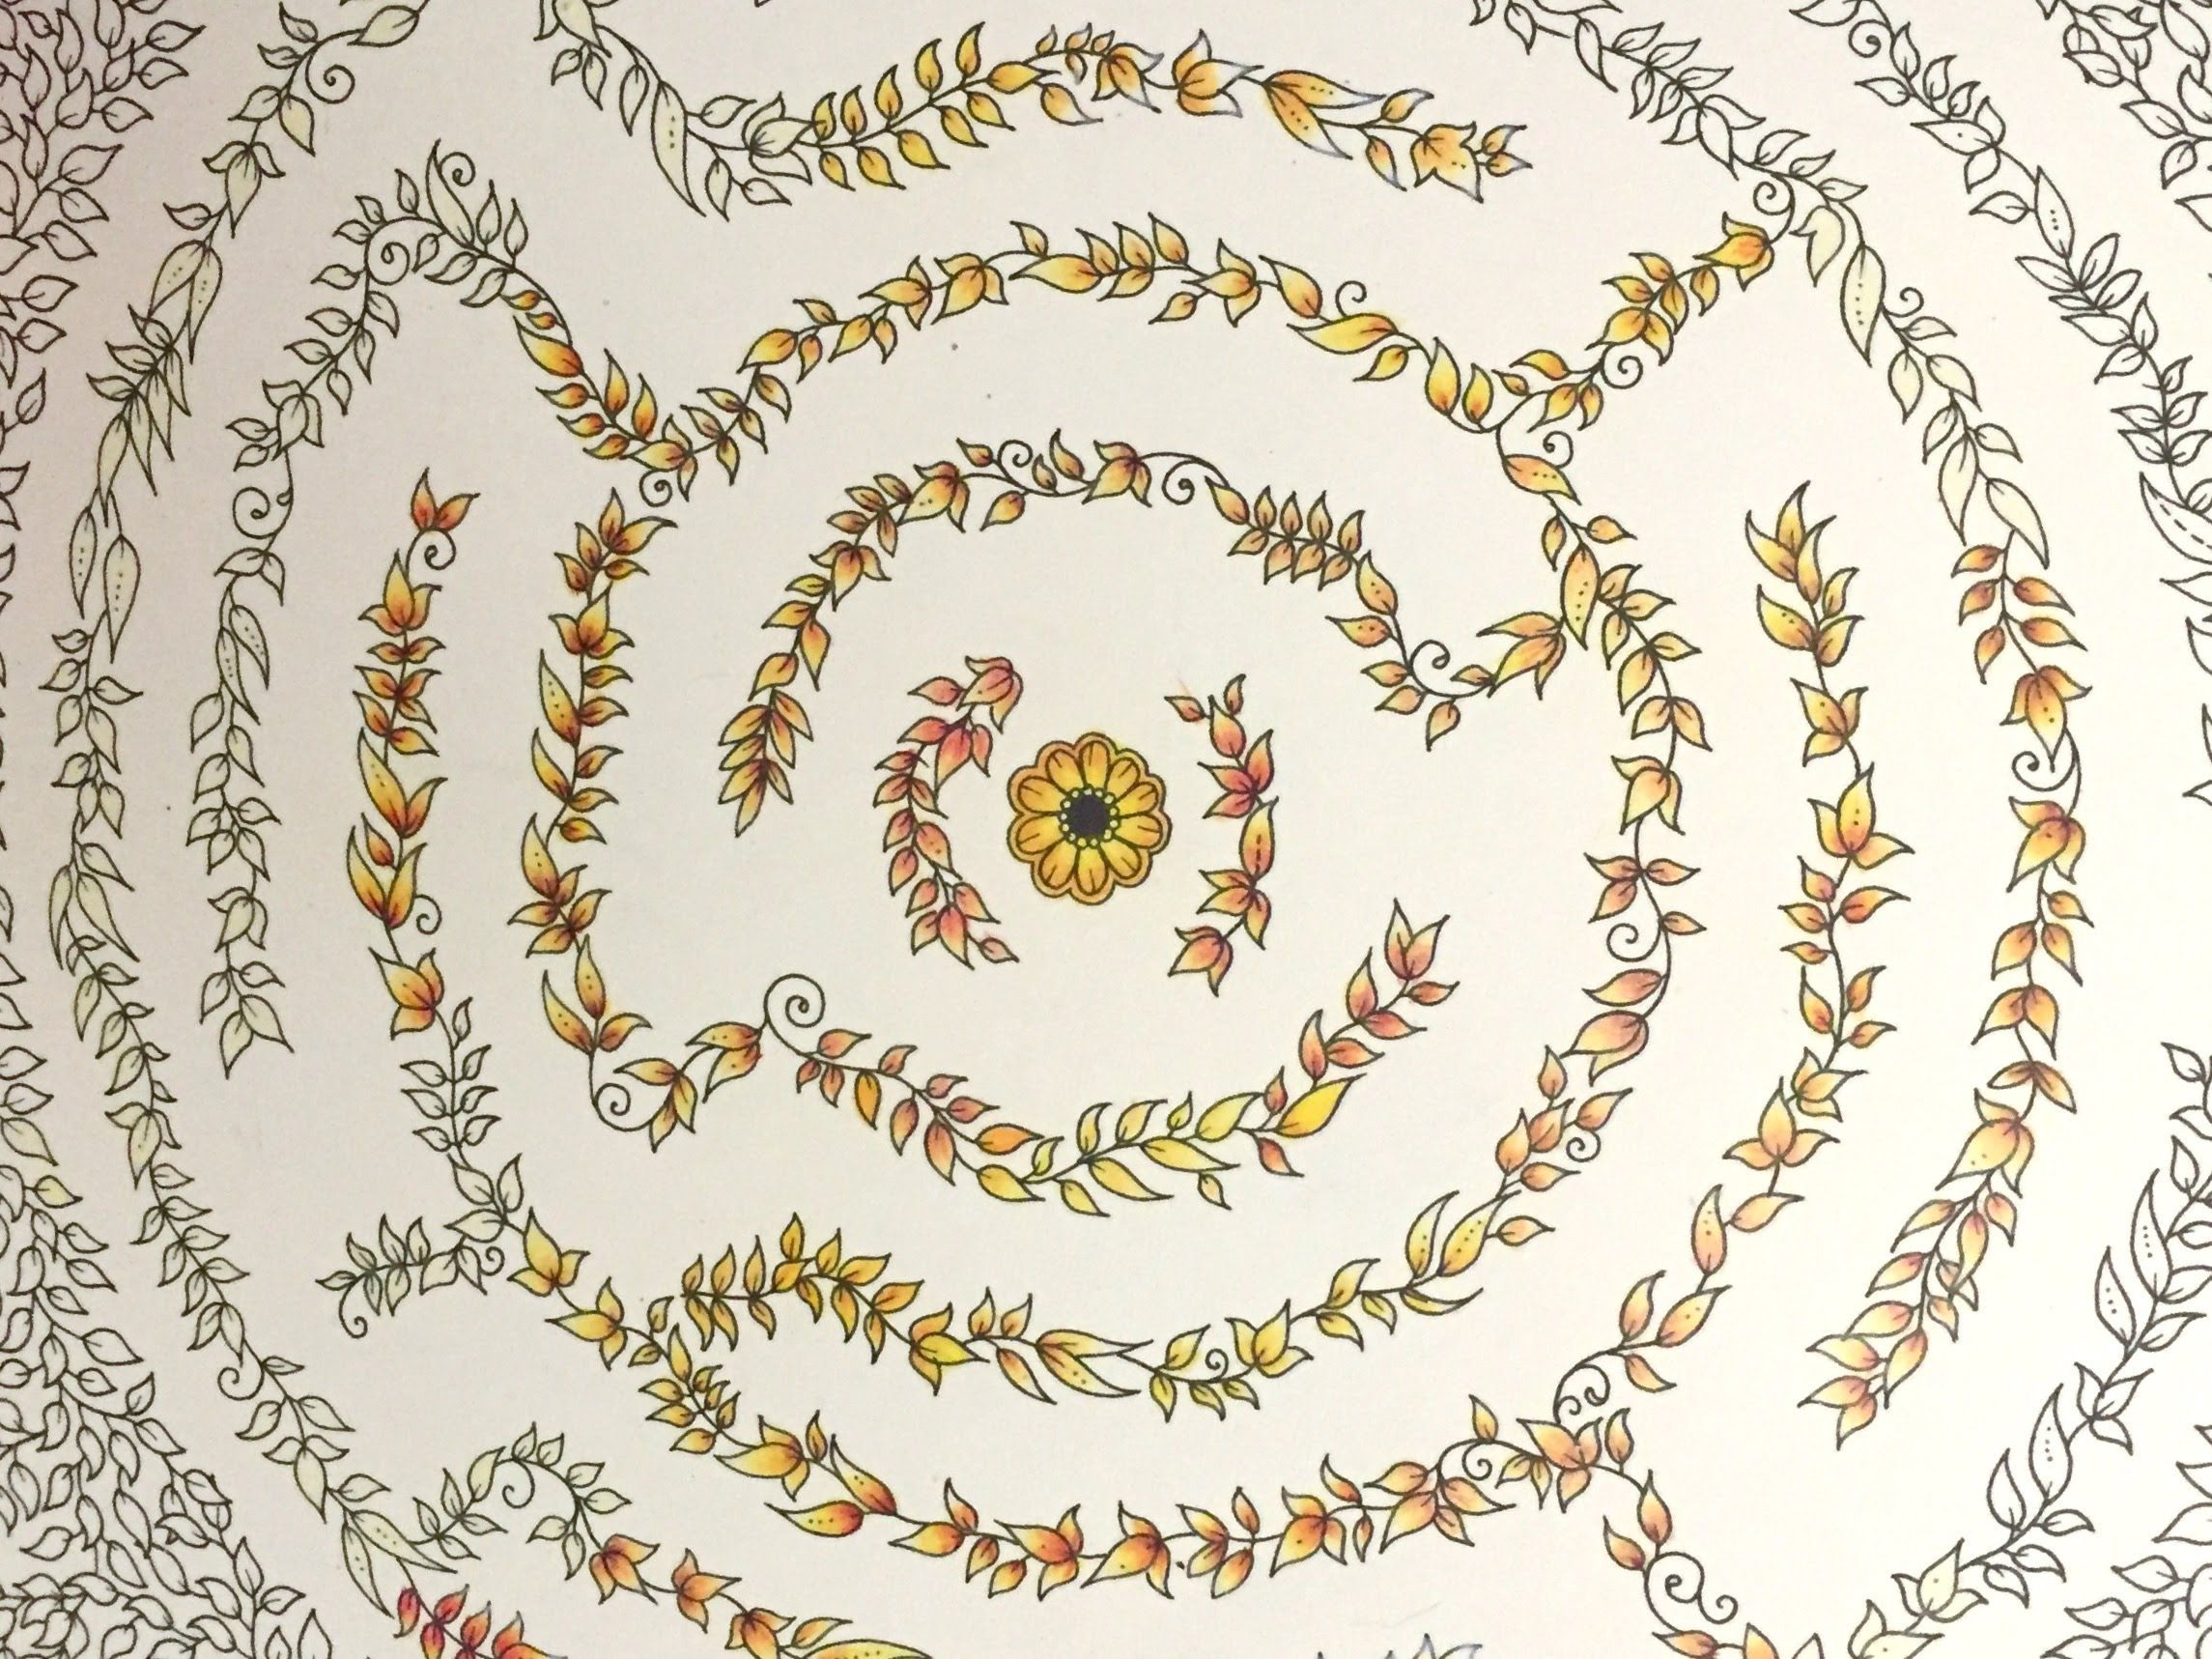 Colored pencil tutorial secret garden adult coloring book adult coloring tutorials for Secret garden adult coloring book